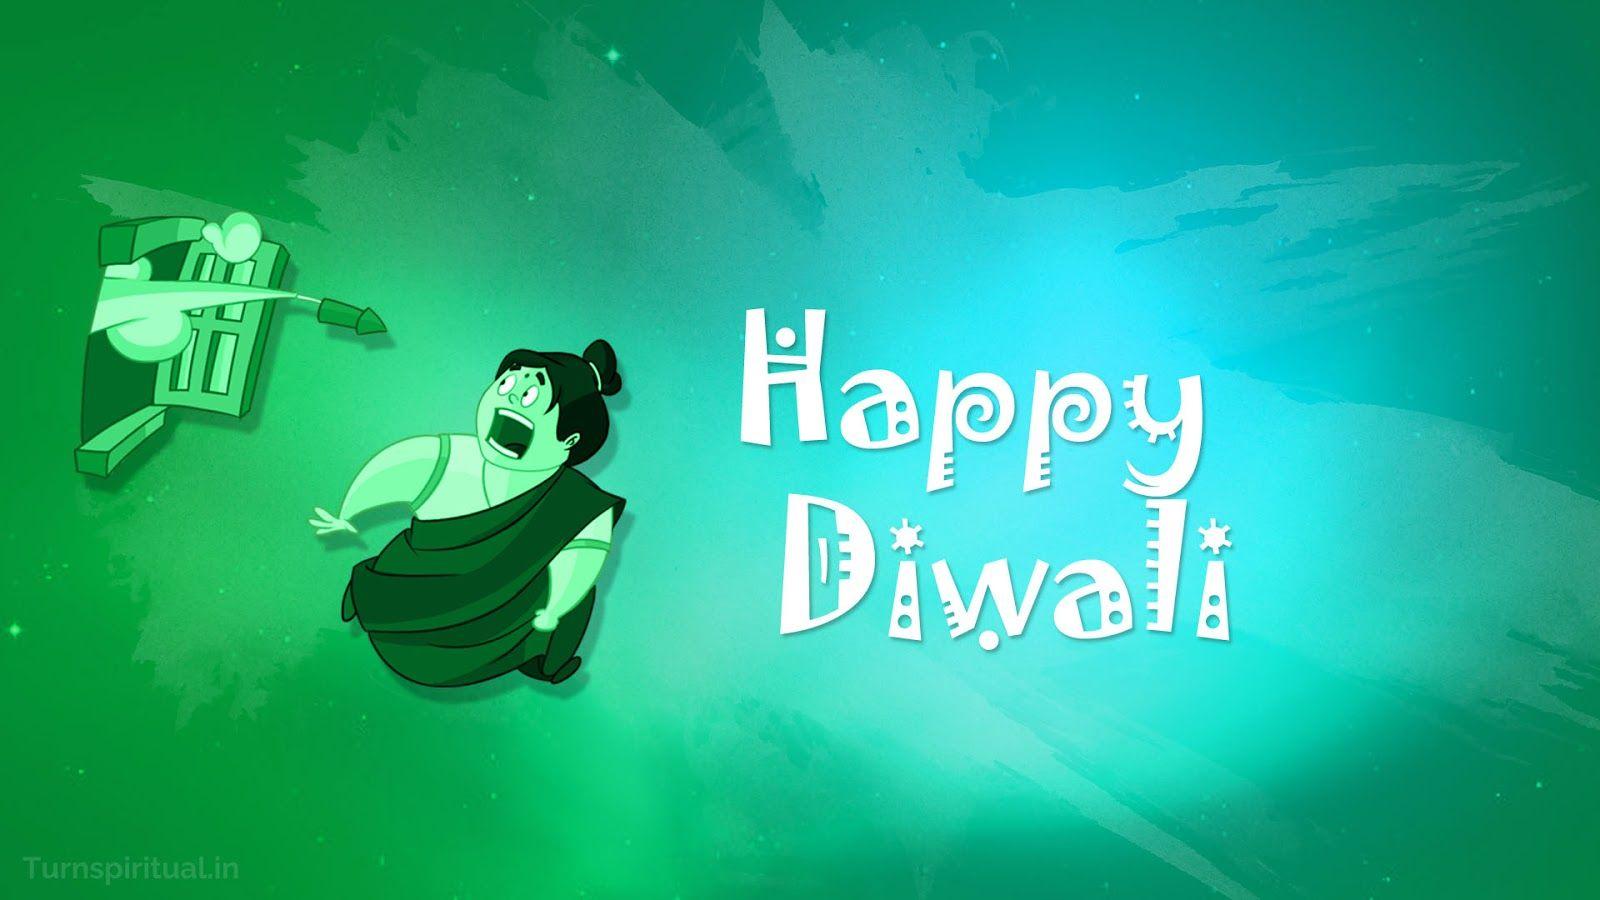 Happy Diwali Deepavali Diwali Wishes Greeting Cards Free Hd